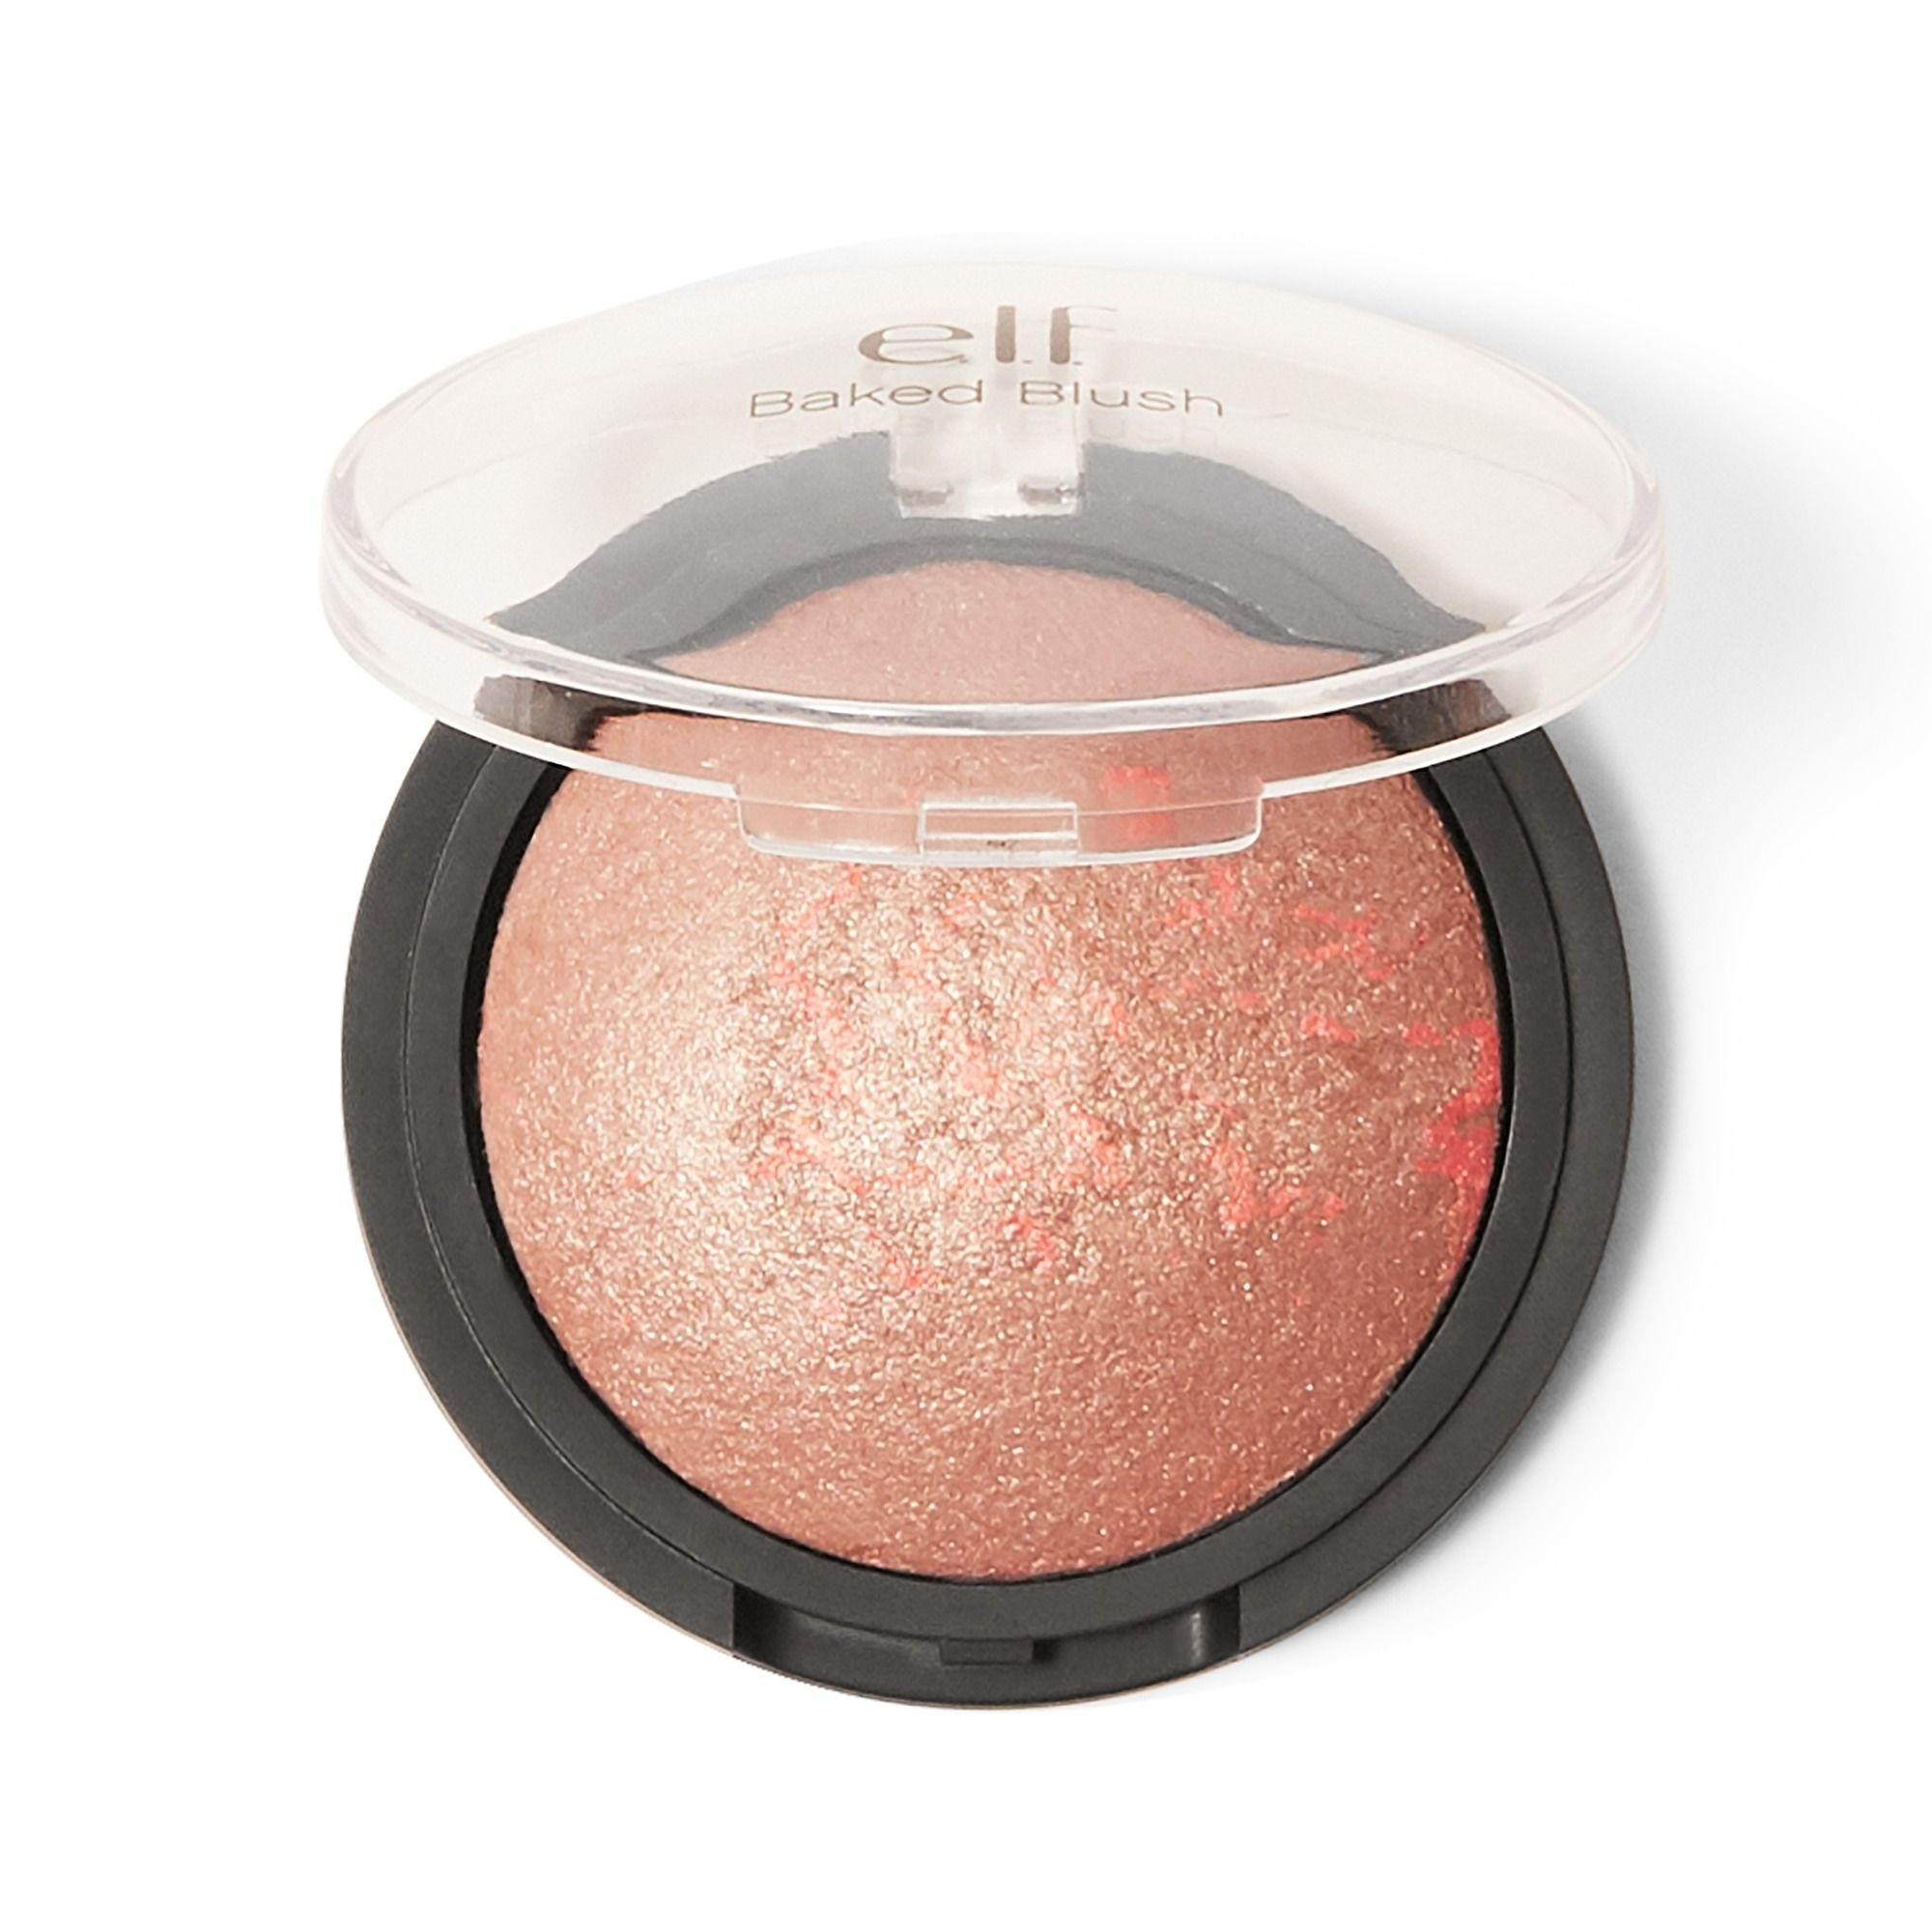 e.l.f. Cosmetics Baked Blush